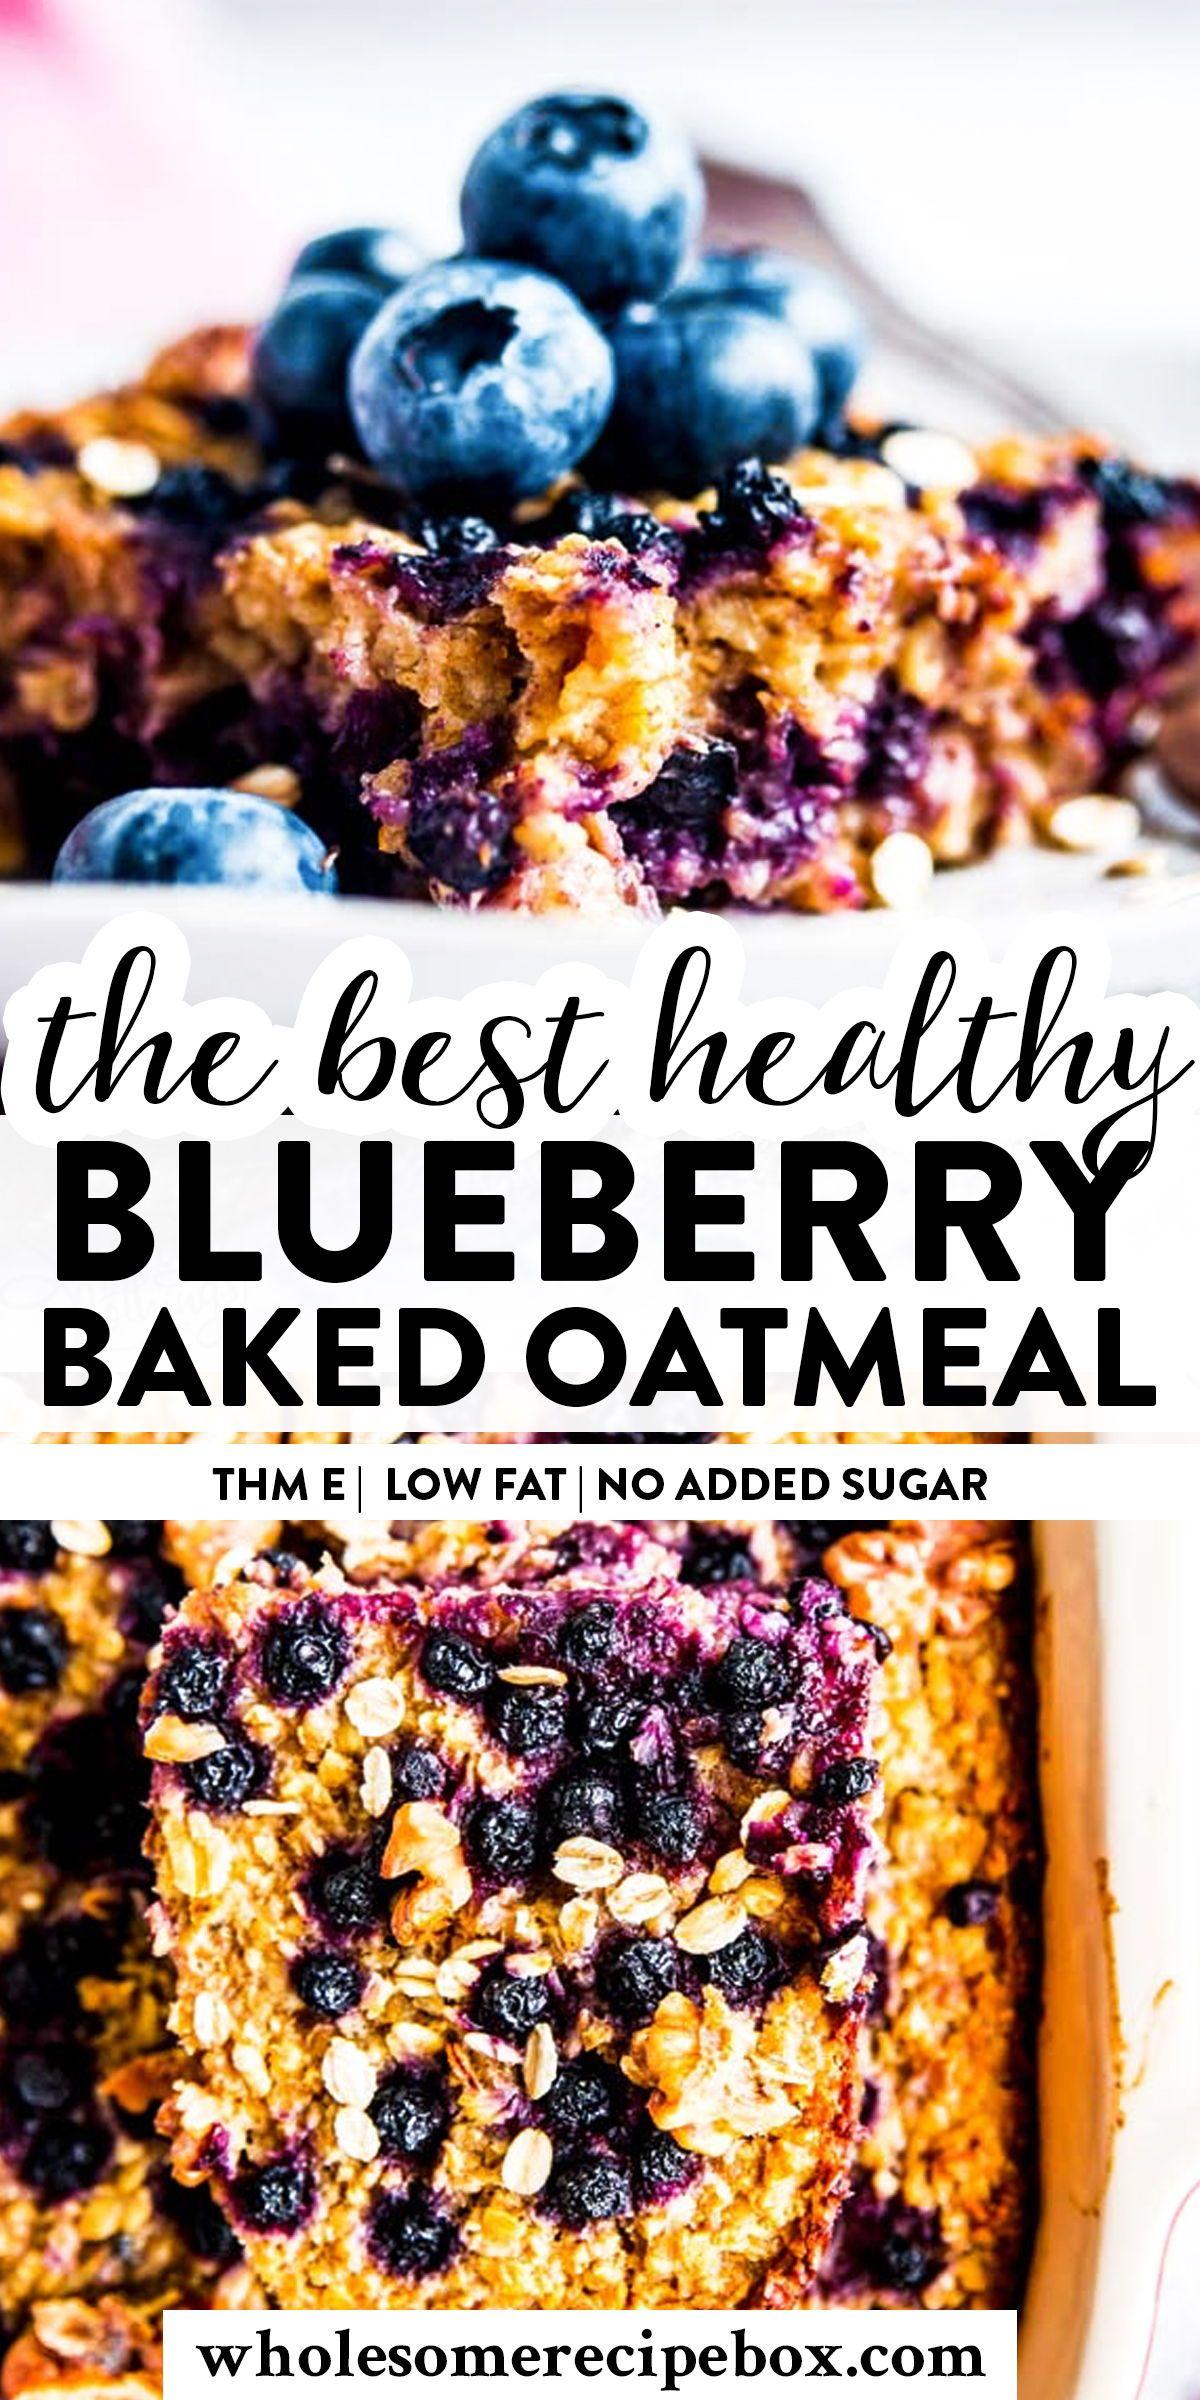 Blueberry Oatmeal Bake Thm E The Wholesome Recipe Box Baked Oatmeal Recipes Healthy Blueberry Recipes Low Calorie Healthy Oatmeal Recipes